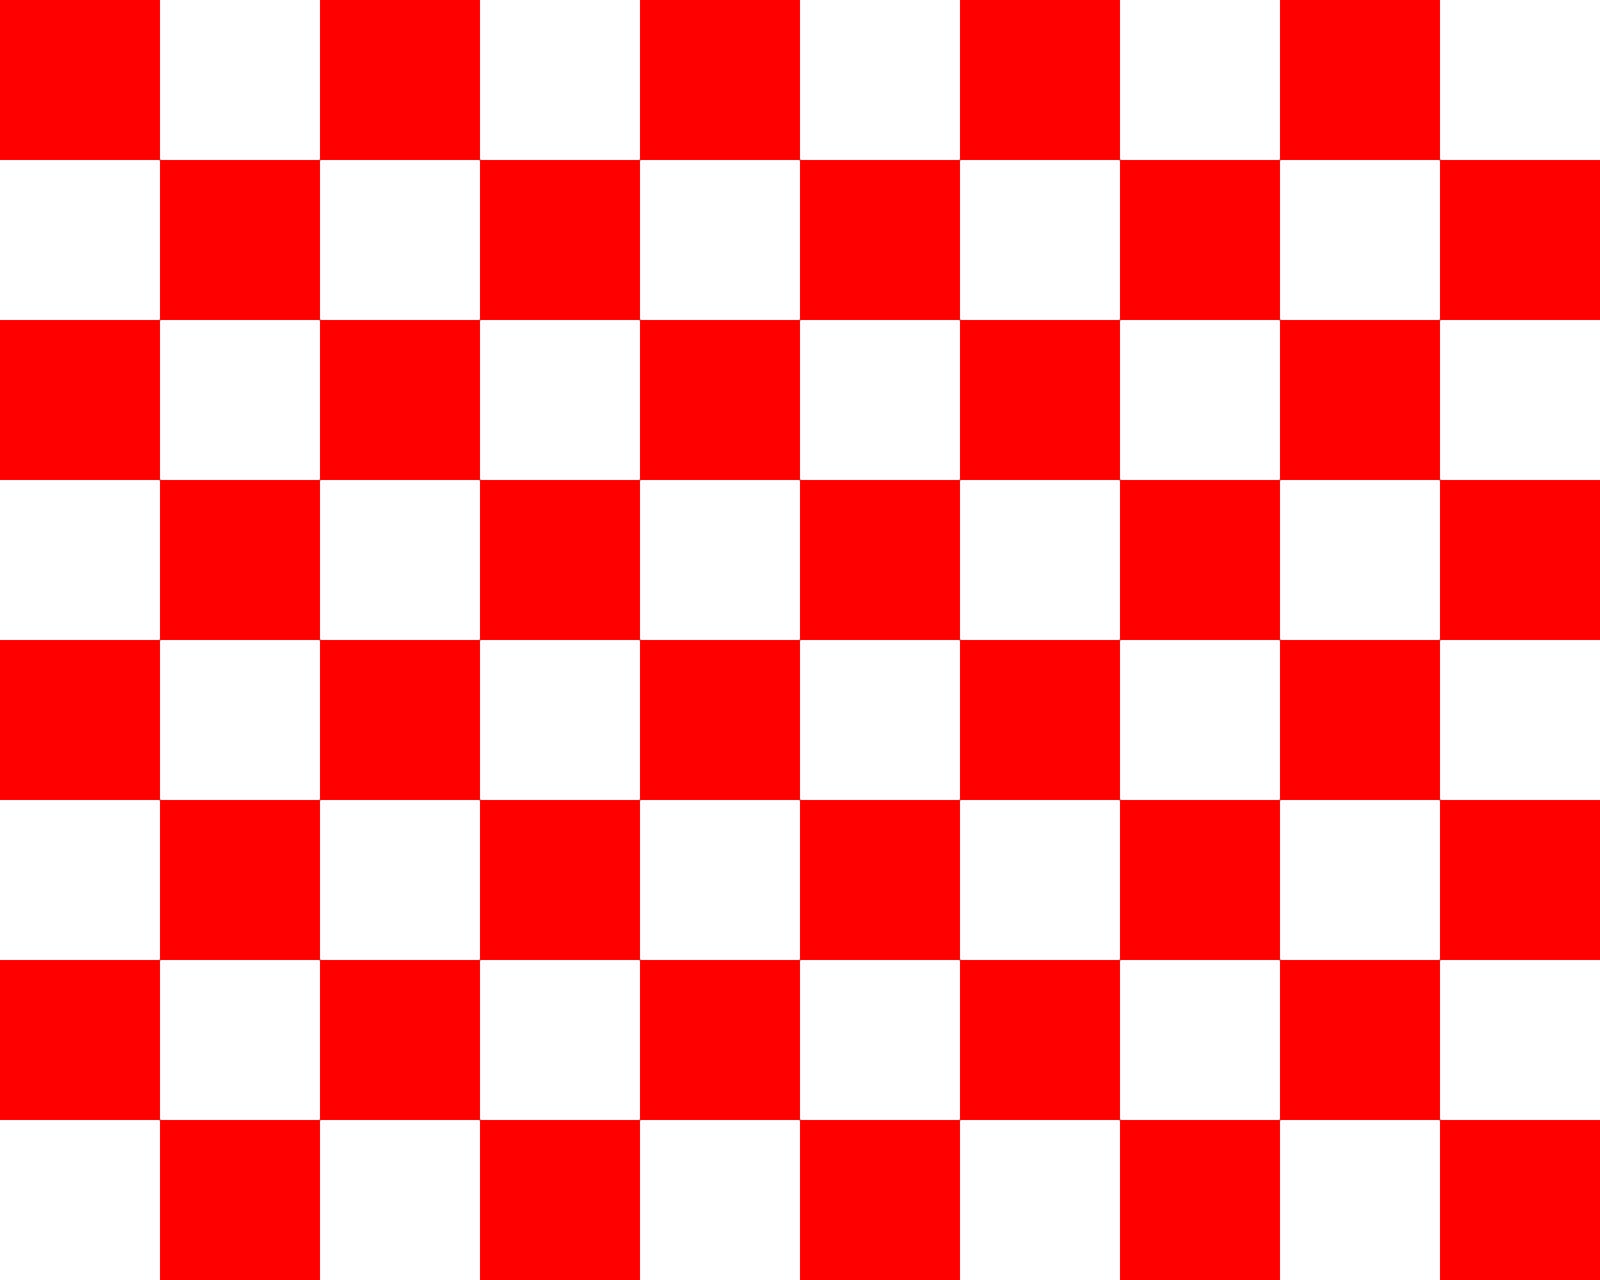 Checkered Wallpaper: Red Checkered Wallpaper